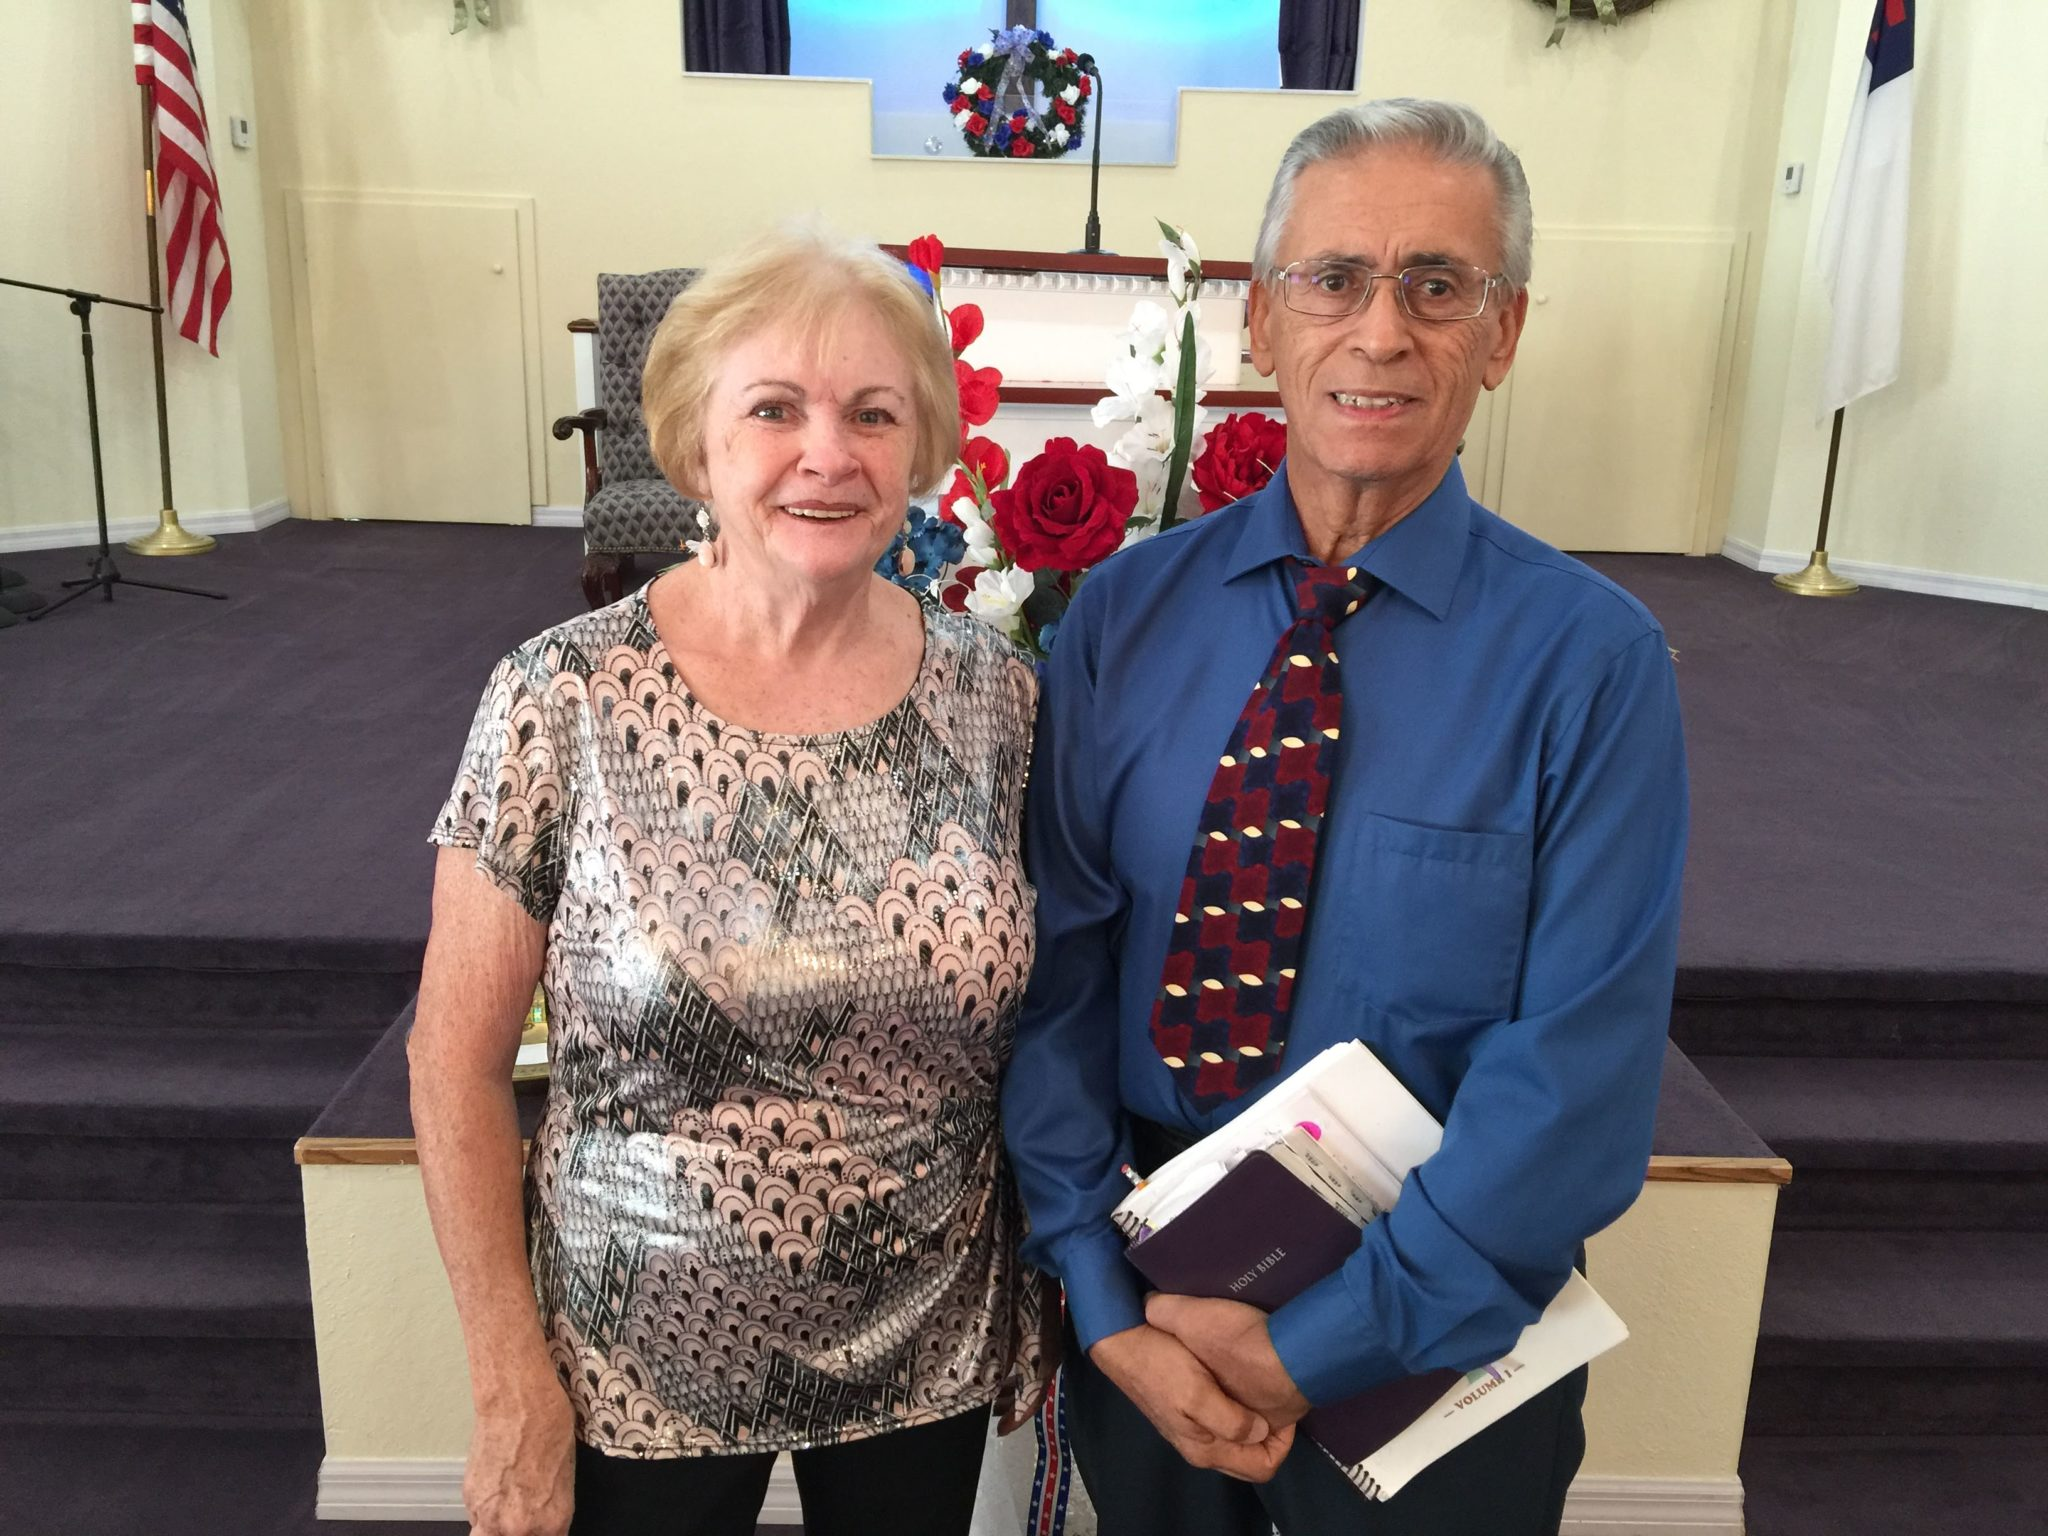 Chuck & Carolyn Benitez